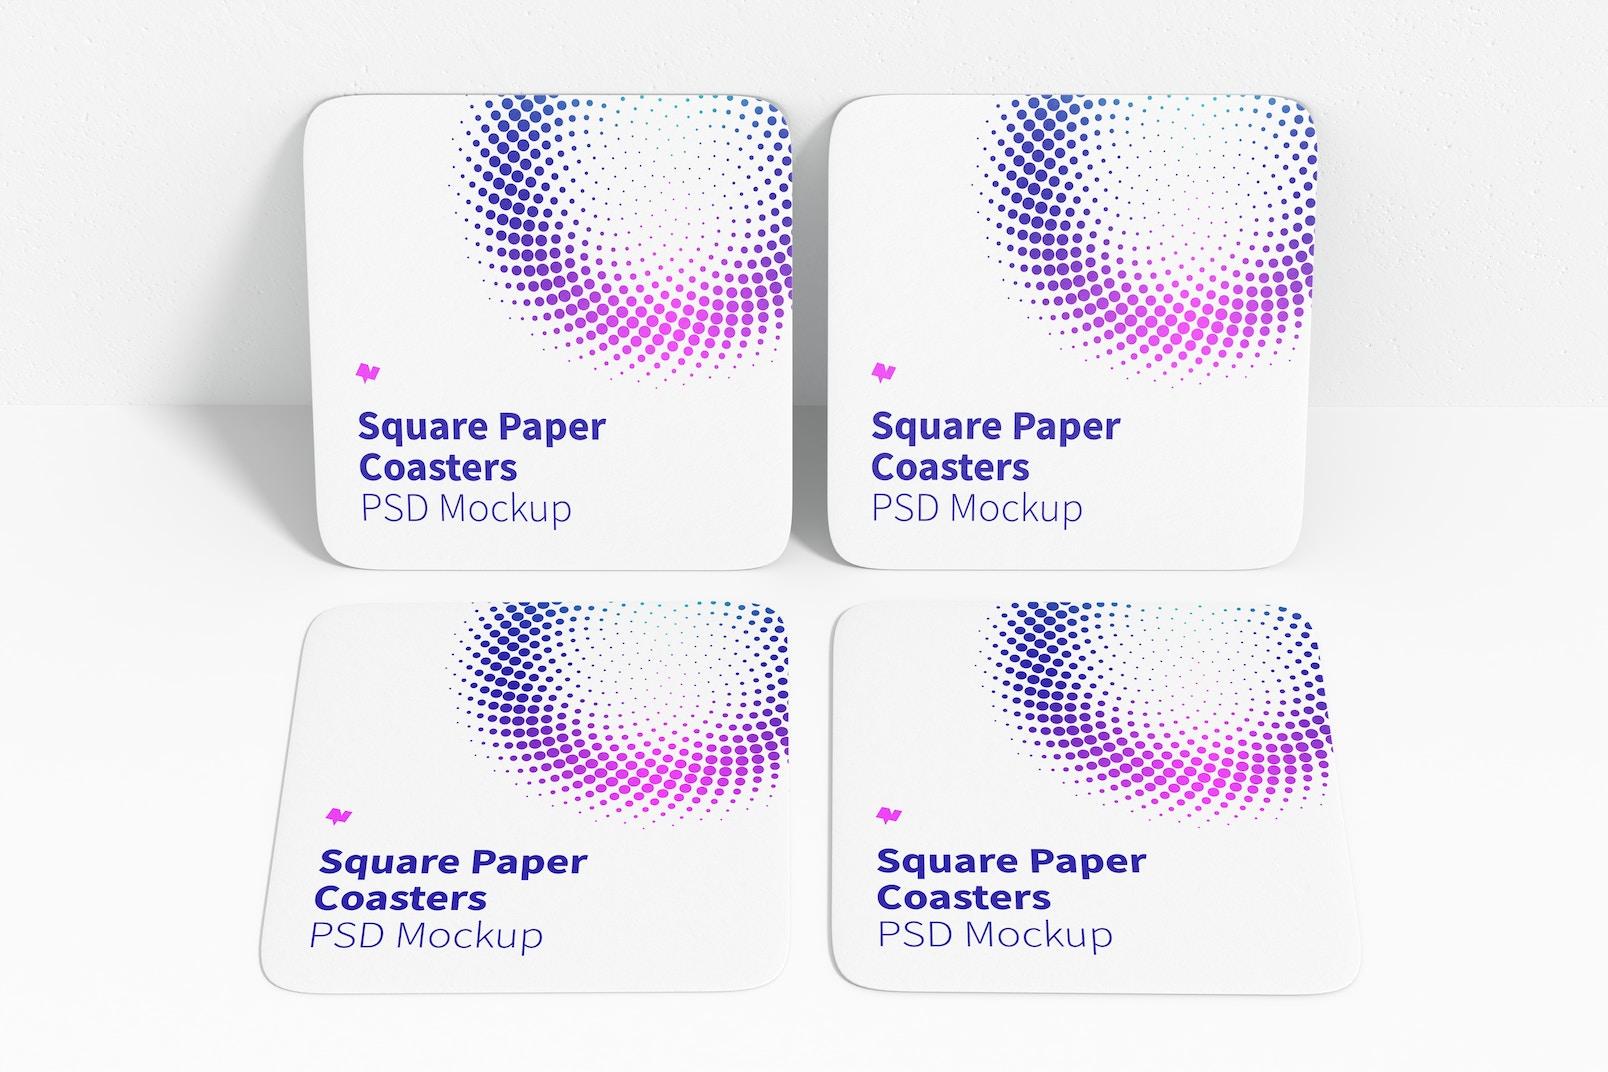 Square Paper Coasters with Mug Mockup